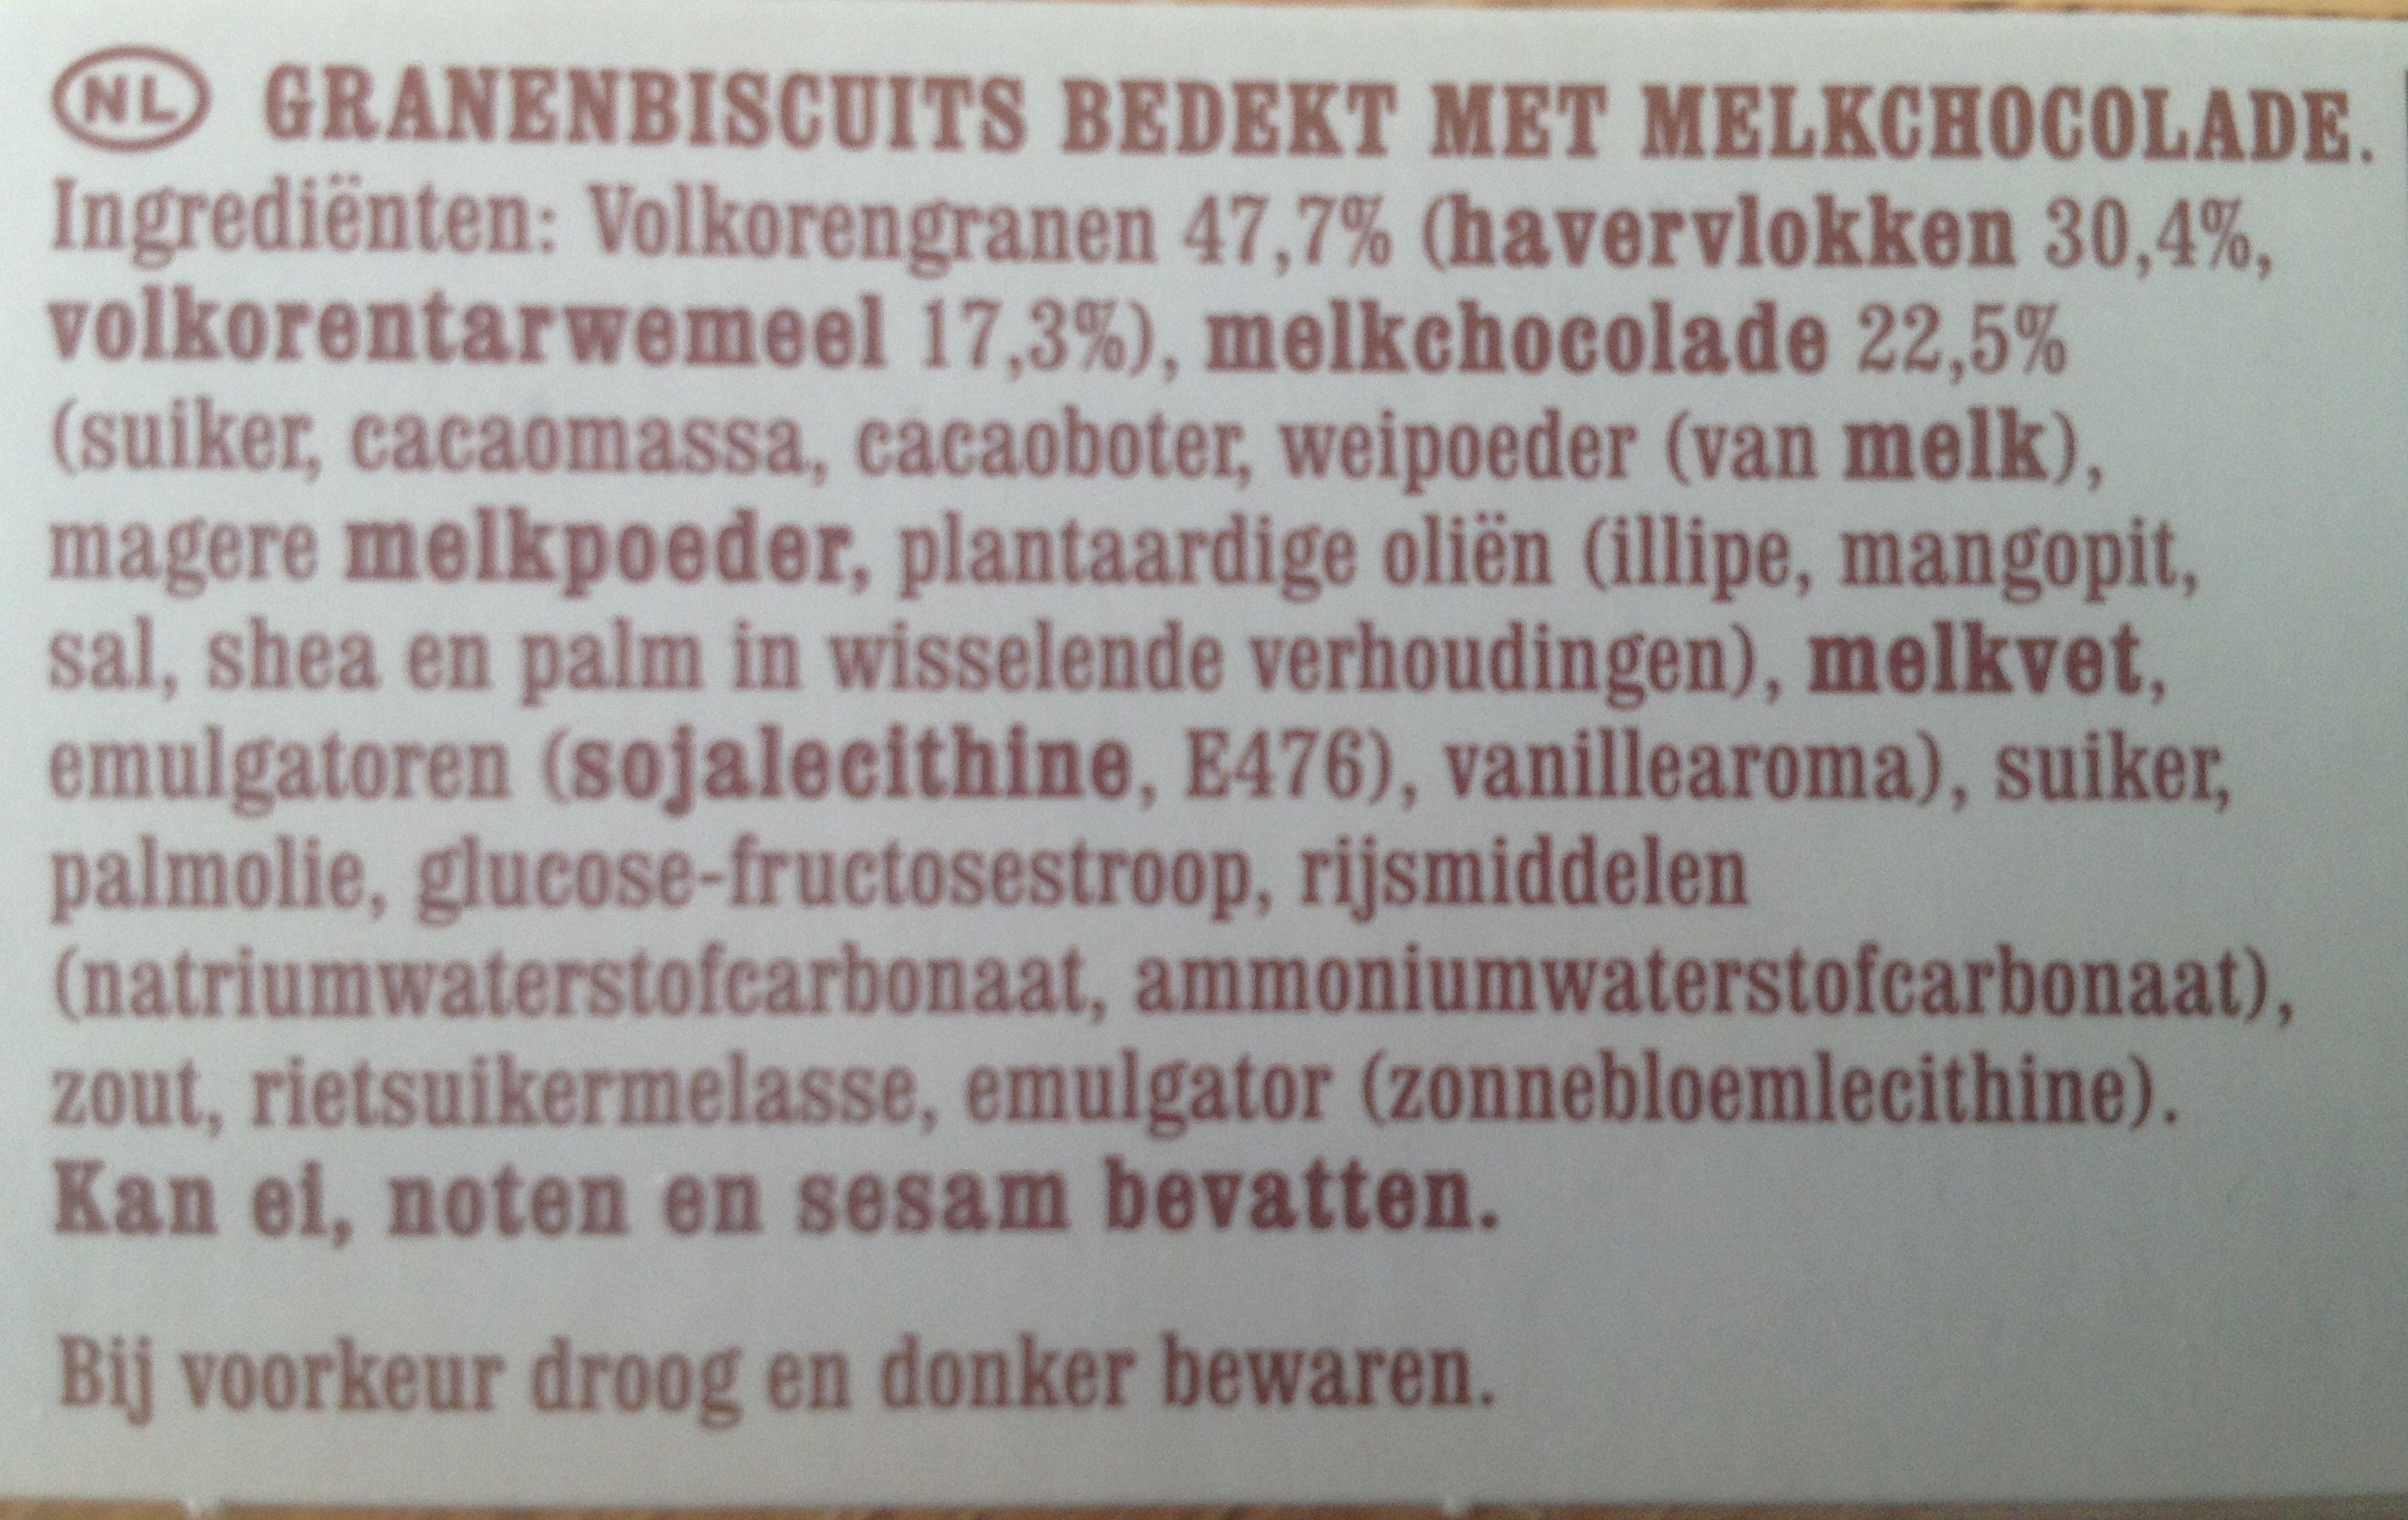 Dunne maiswafels - Ingrediënten - nl